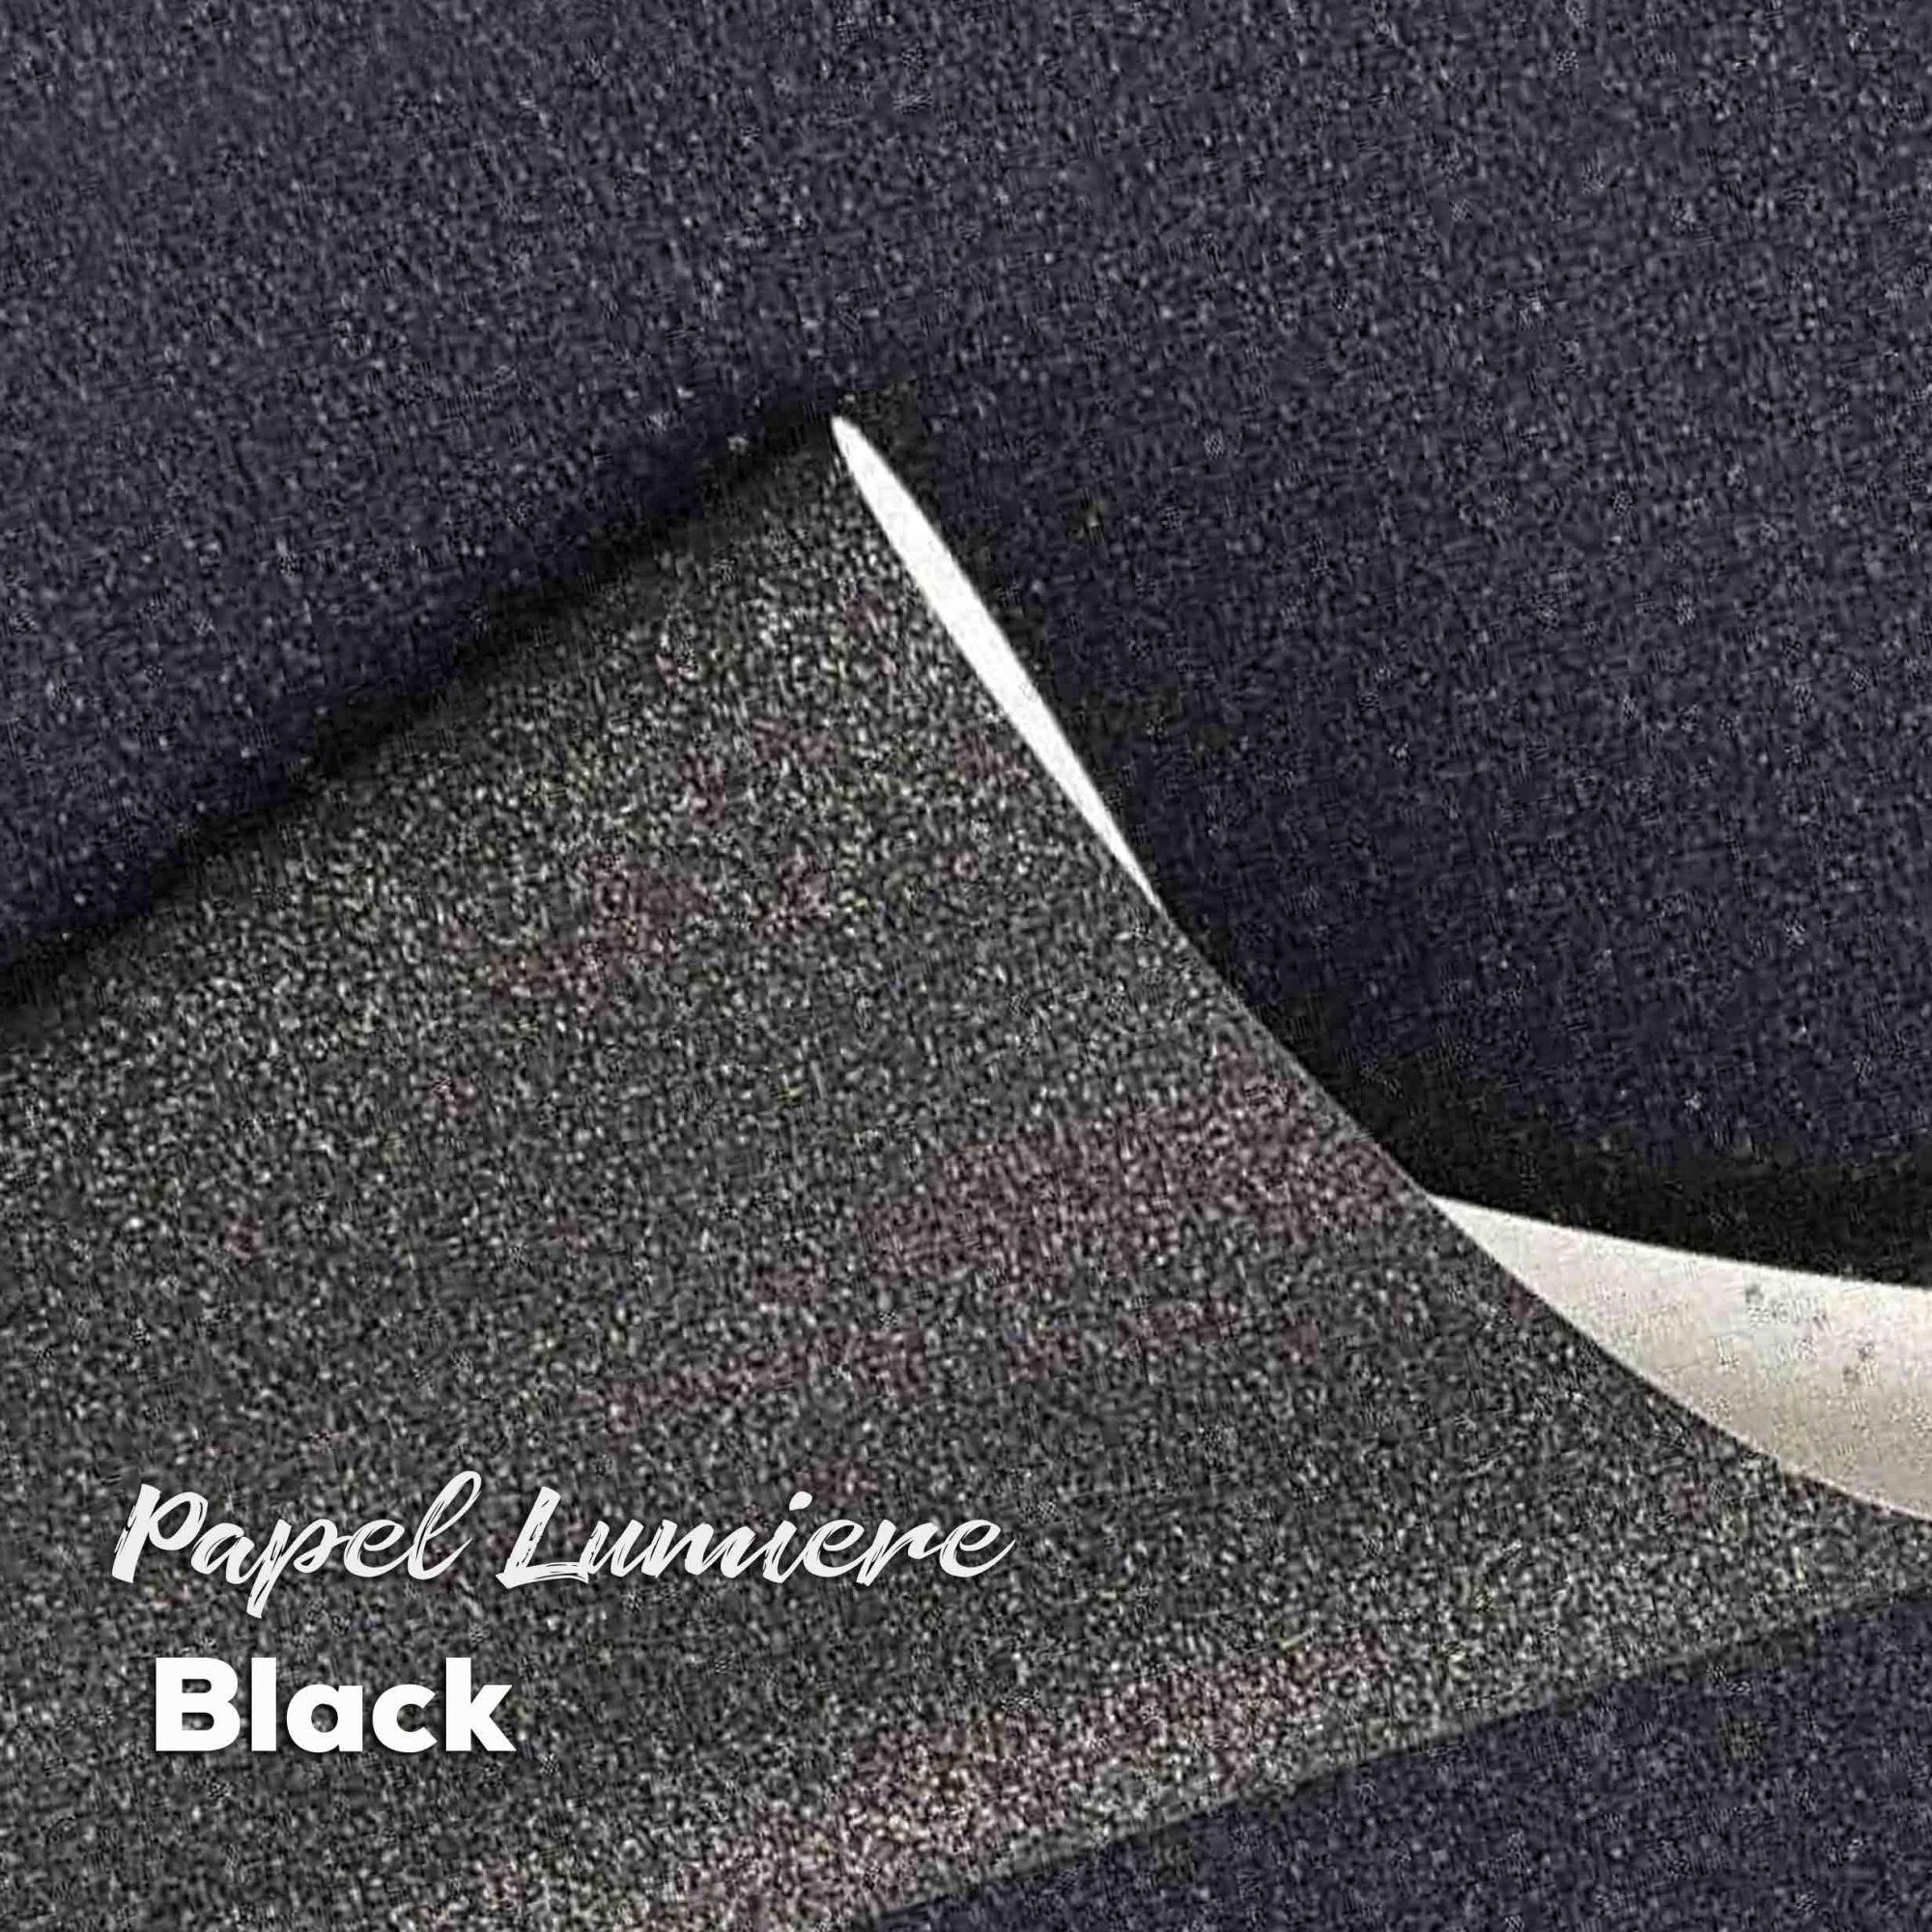 Papel Glitter Lumiere Black 150g - Preto 30,5x30,5cm com 6 folhas